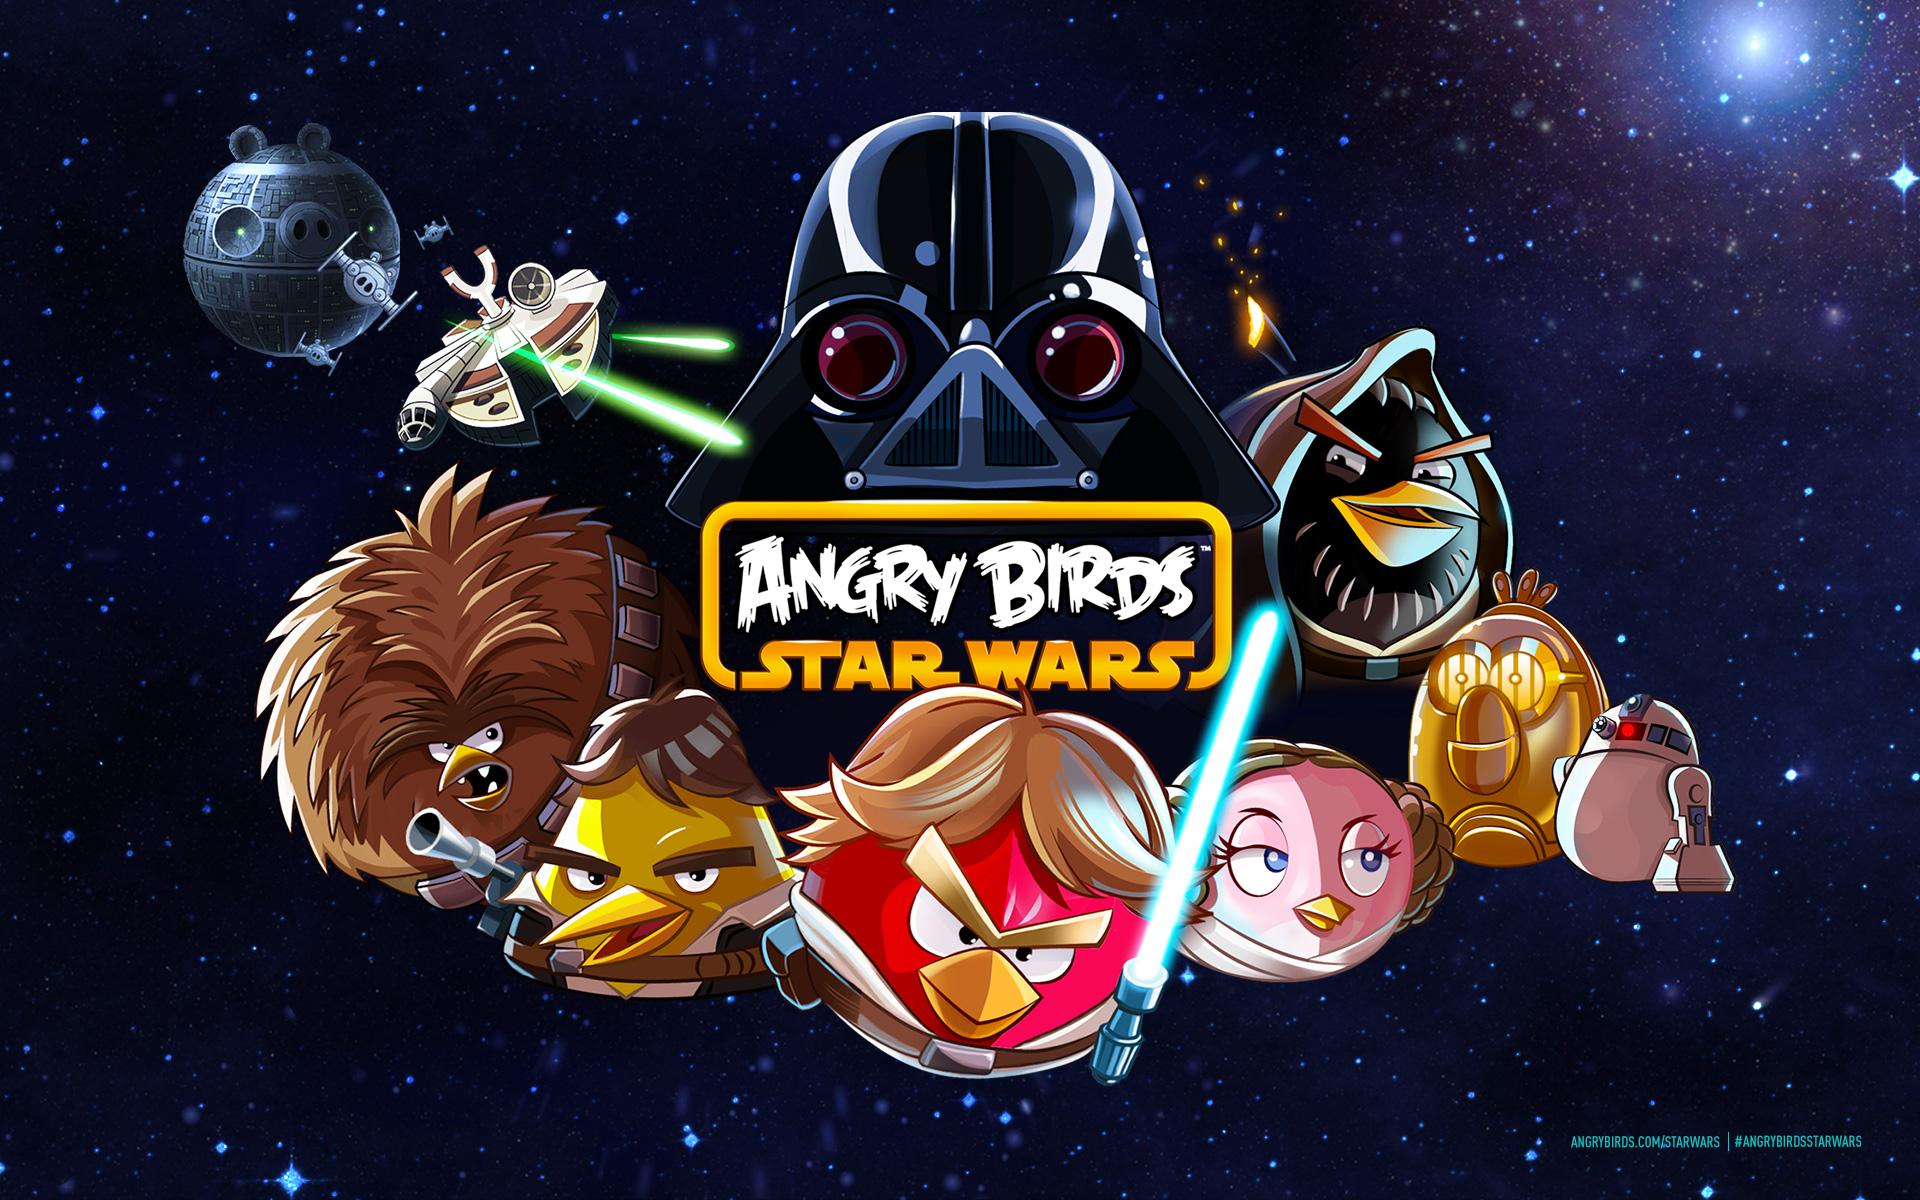 angrybirds_starwars